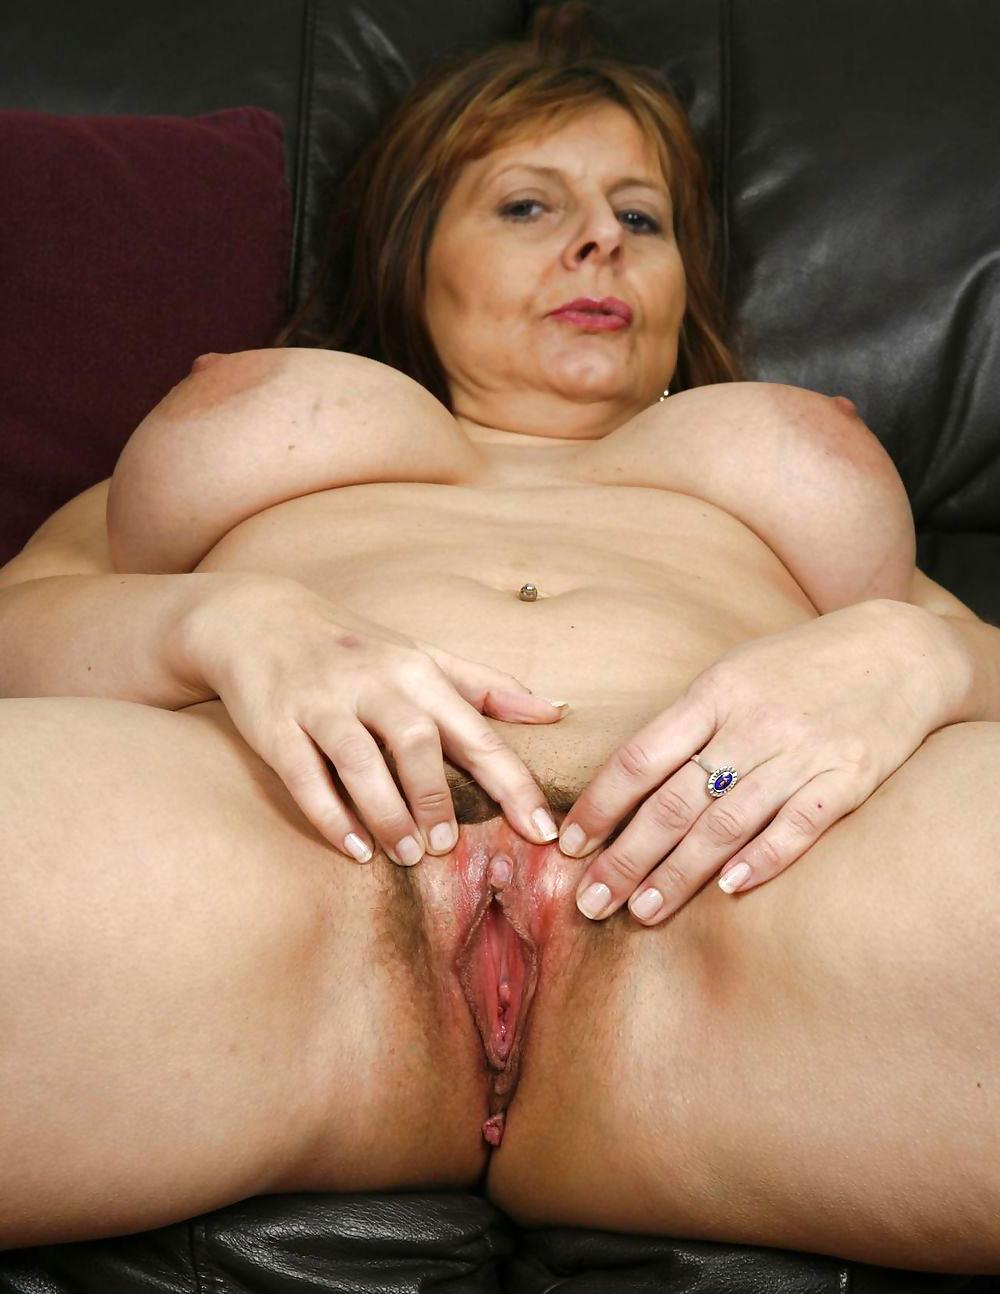 Women Playing Herself Dildo